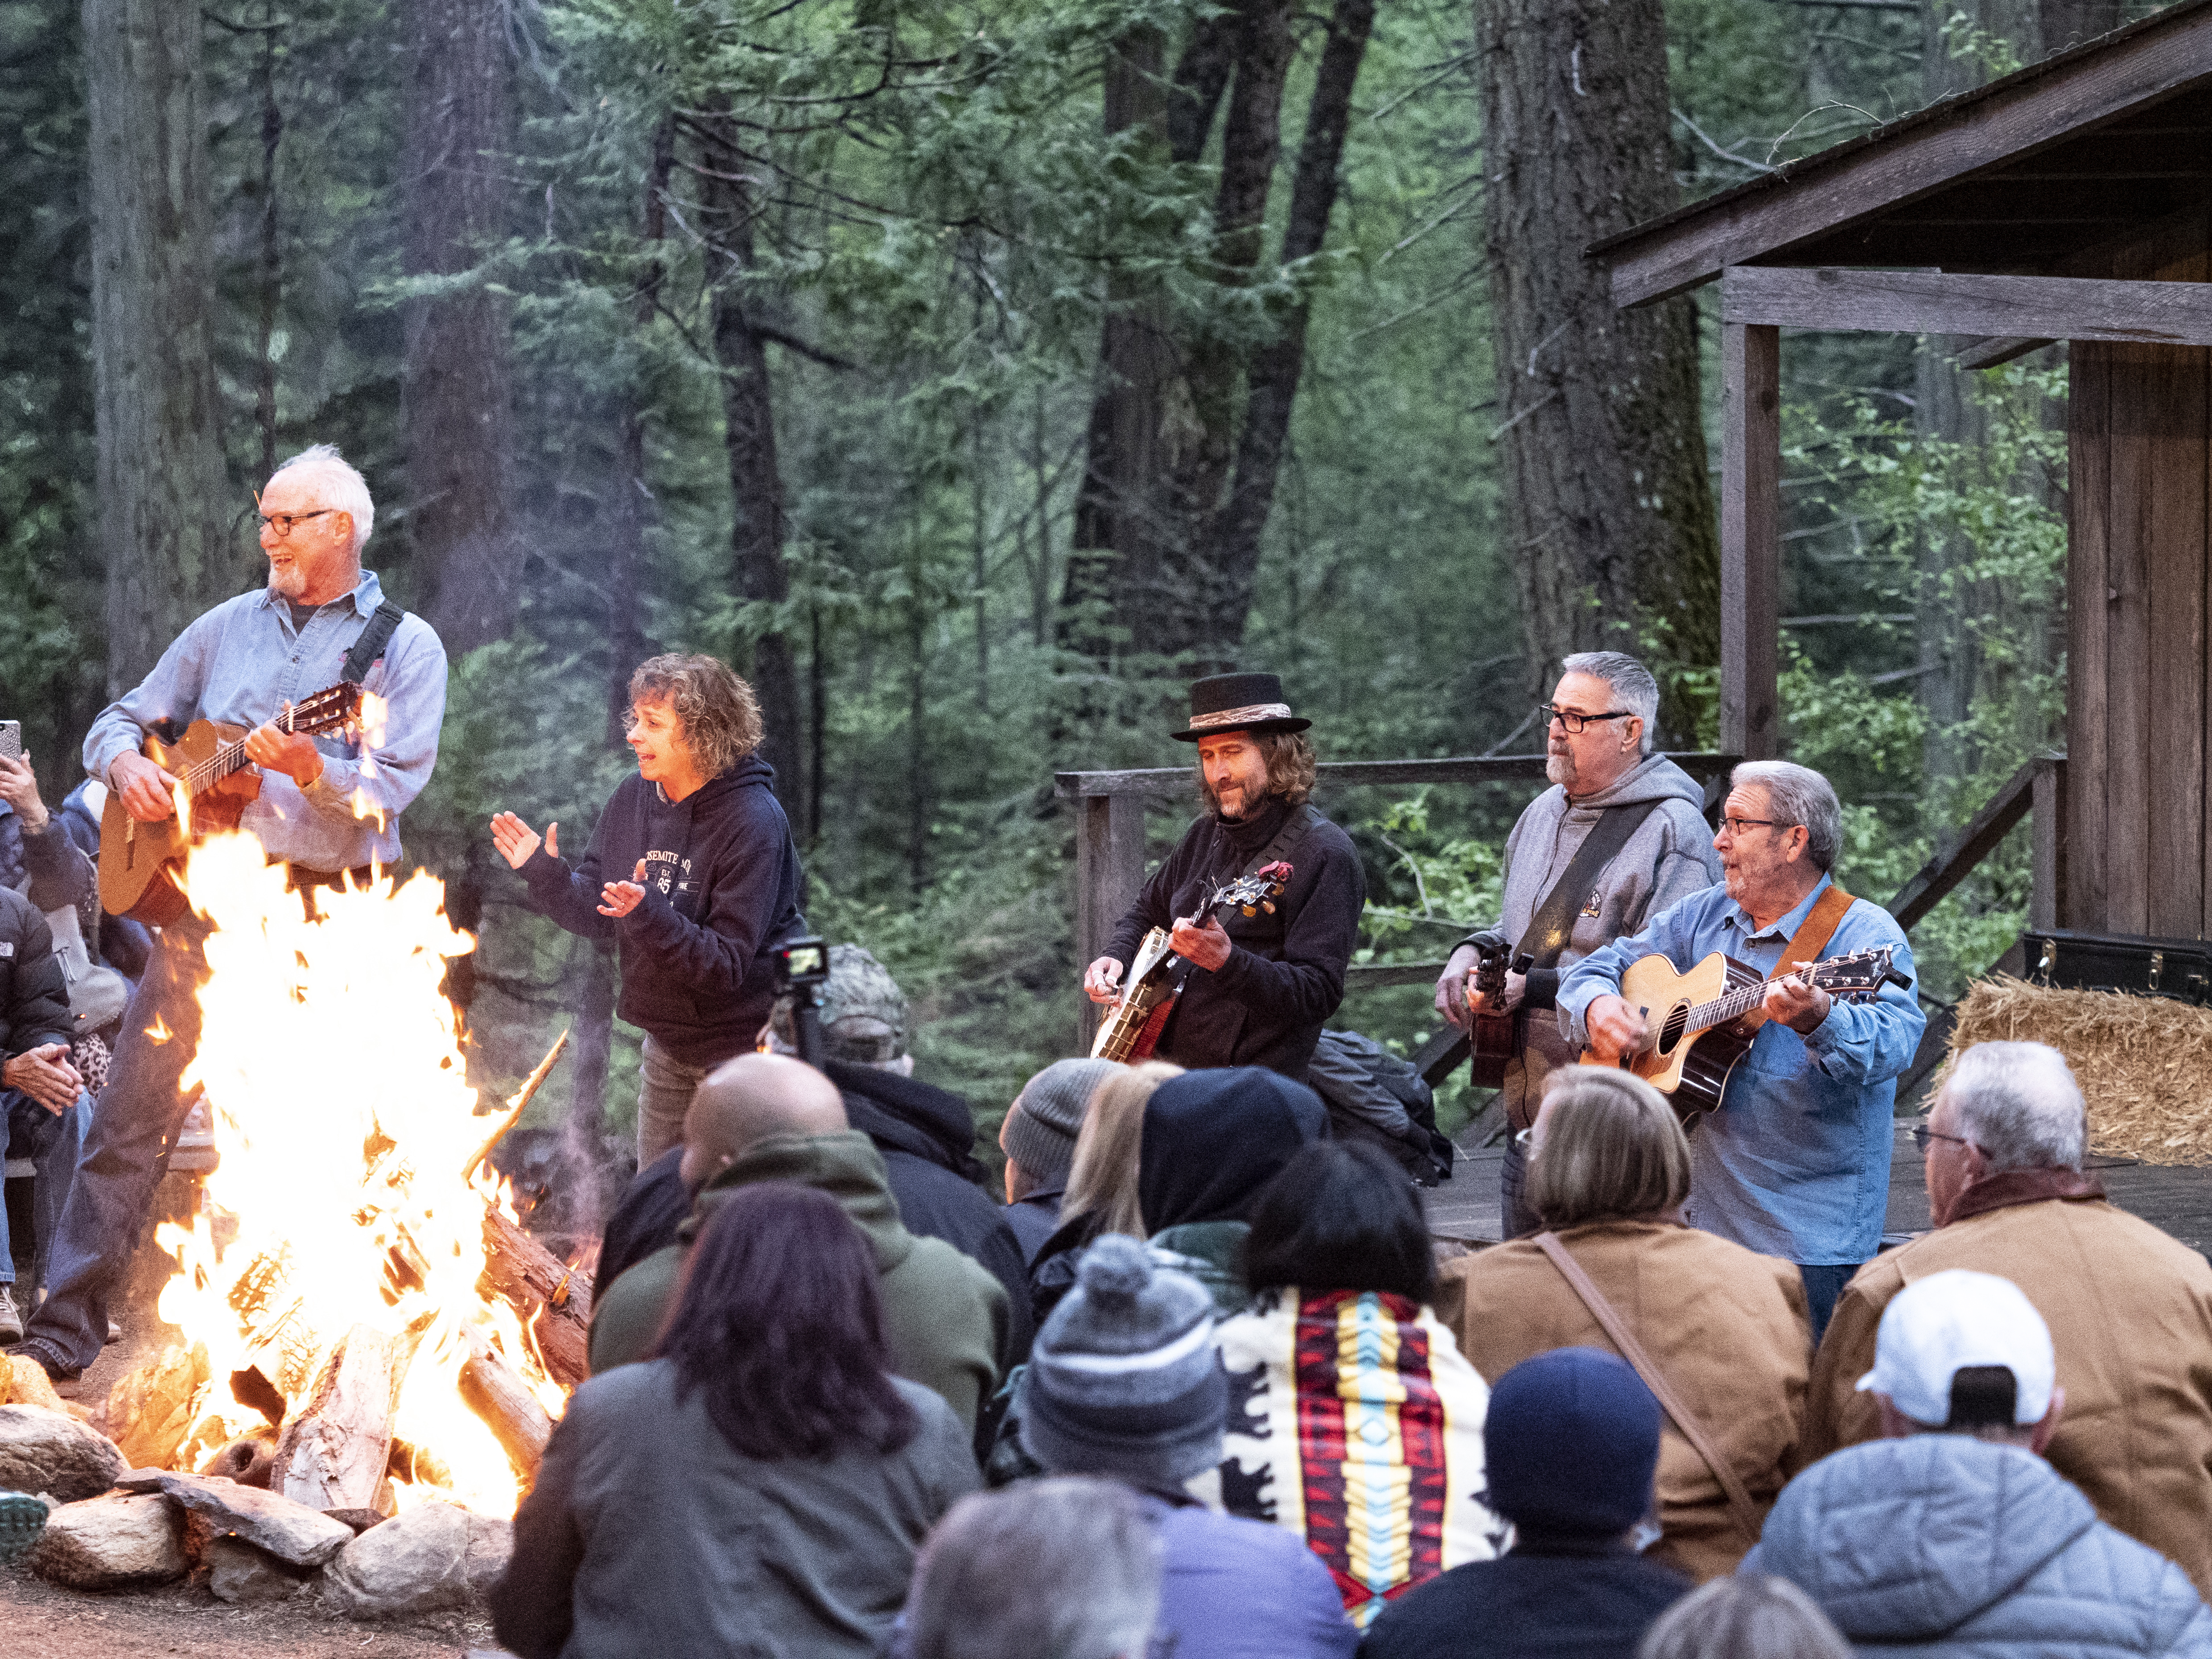 Sing-along at the Yosemite Mountain Sugar Pine Railroads Moonlight Special